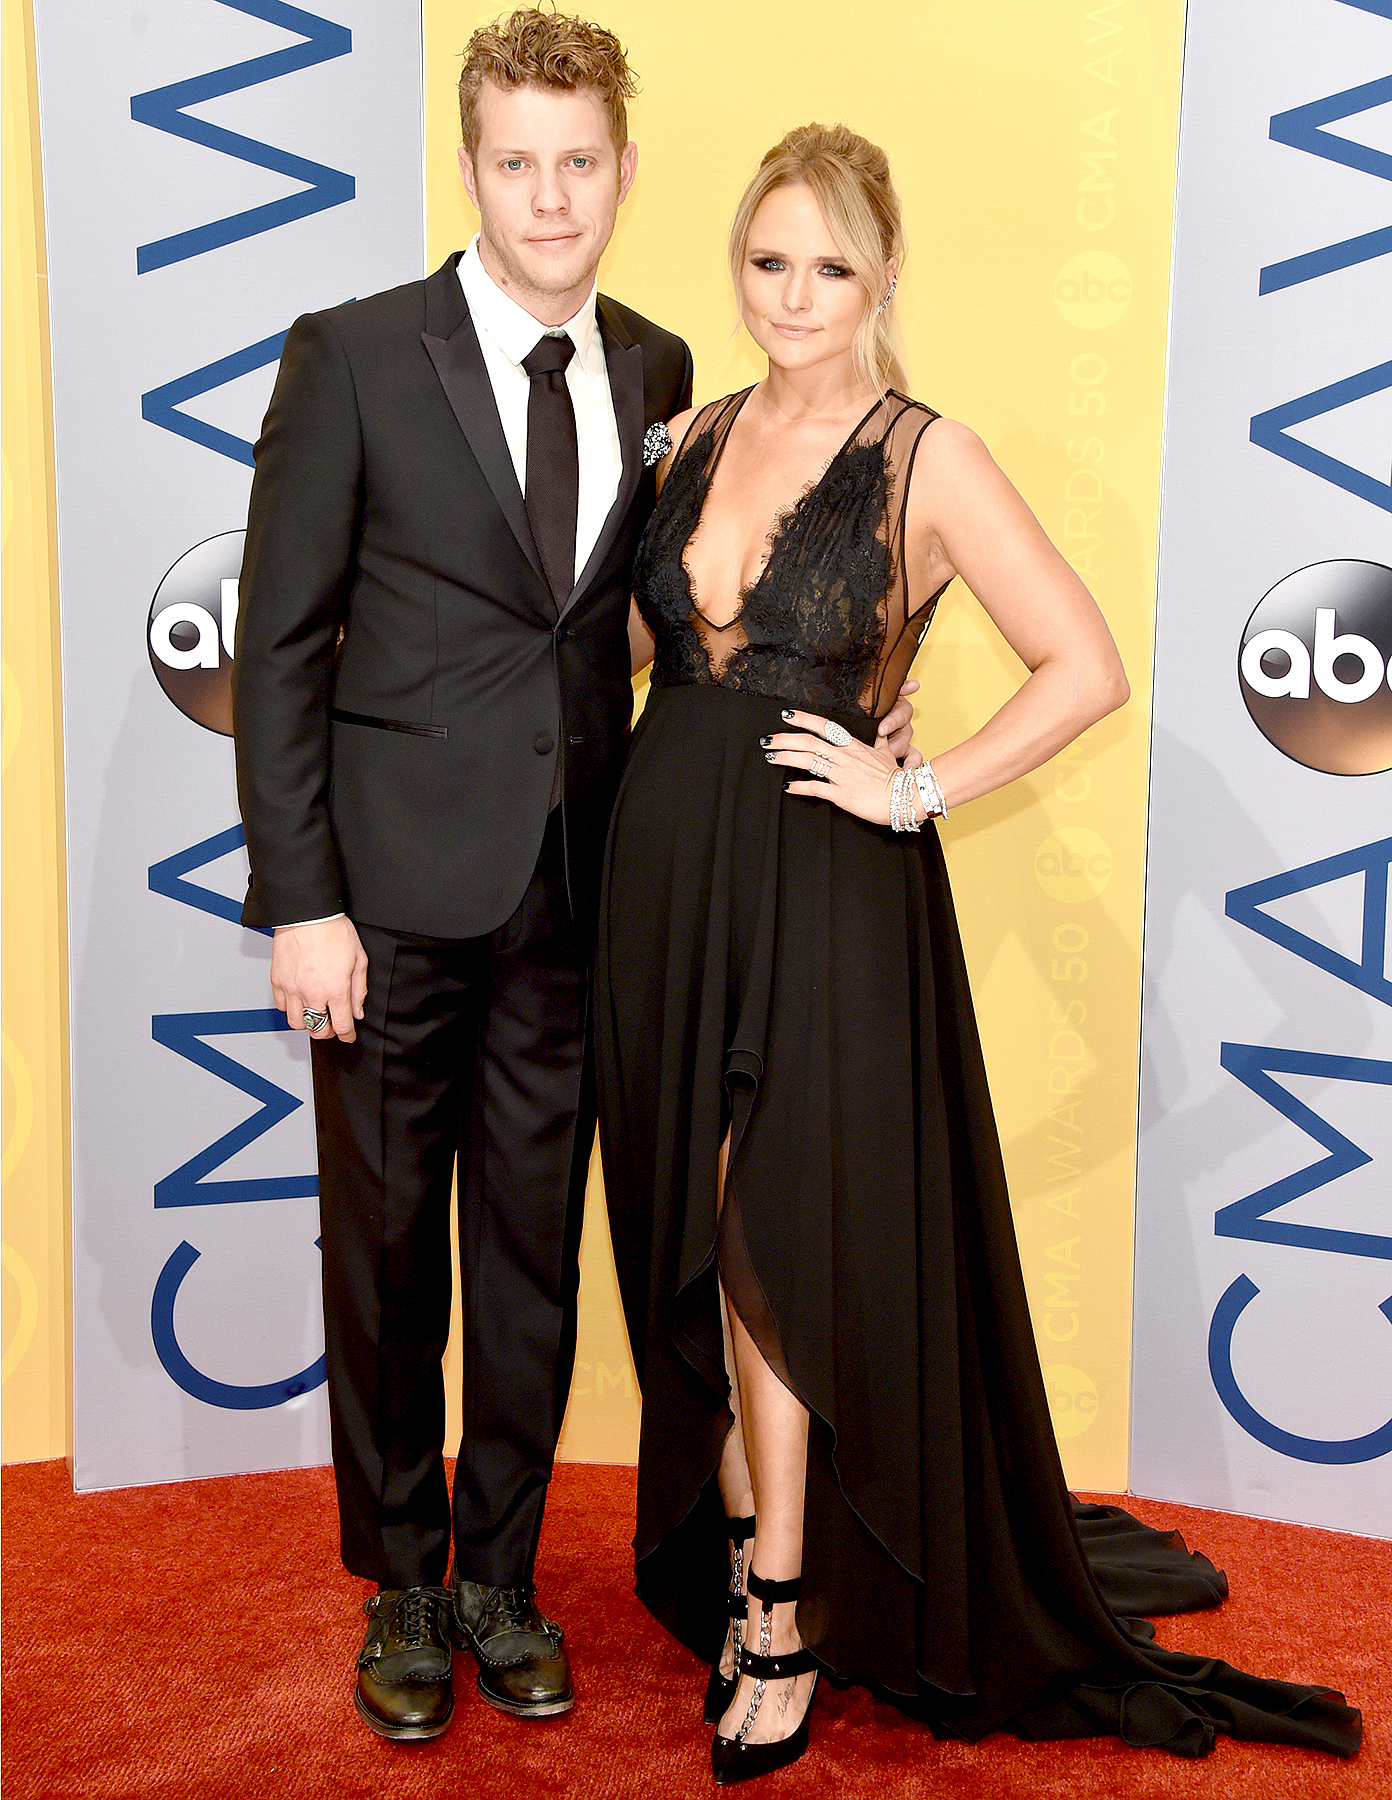 Anderson East and Miranda Lambert attend the 50th Annual CMA Awards at the Bridgestone Arena on Nov. 2, 2016, in Nashville.